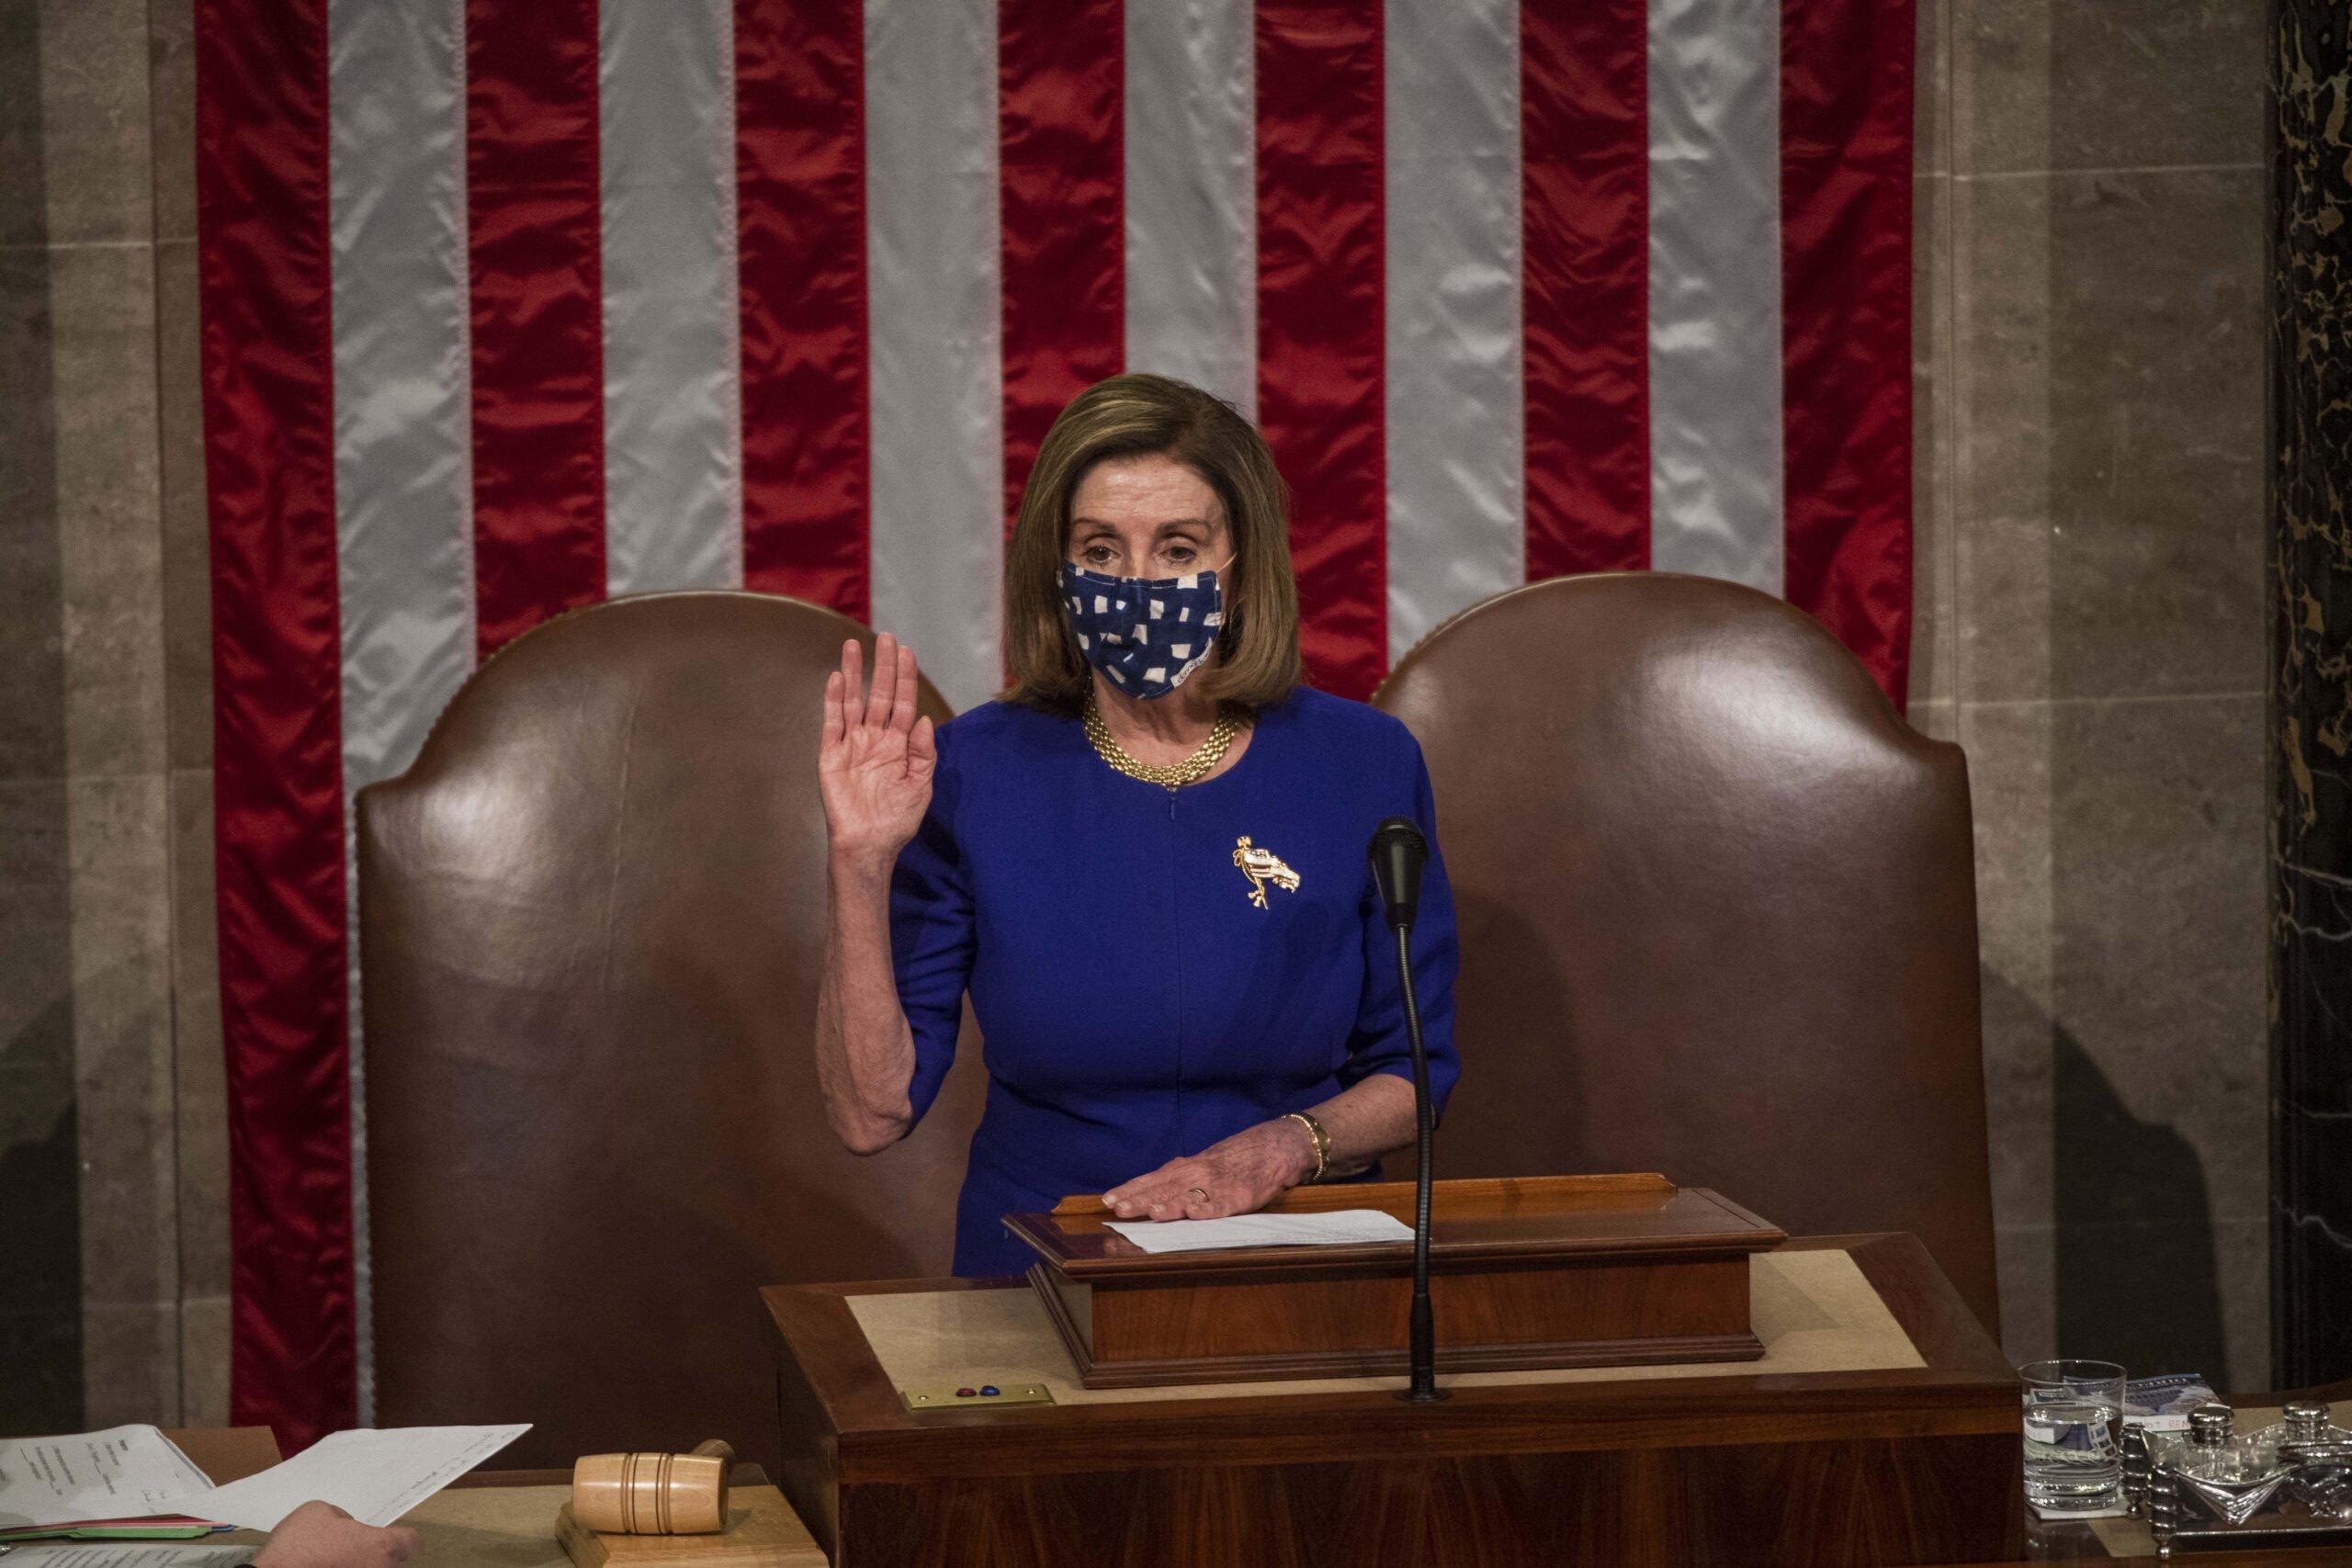 Usa 2020 - Pelosi - speaker